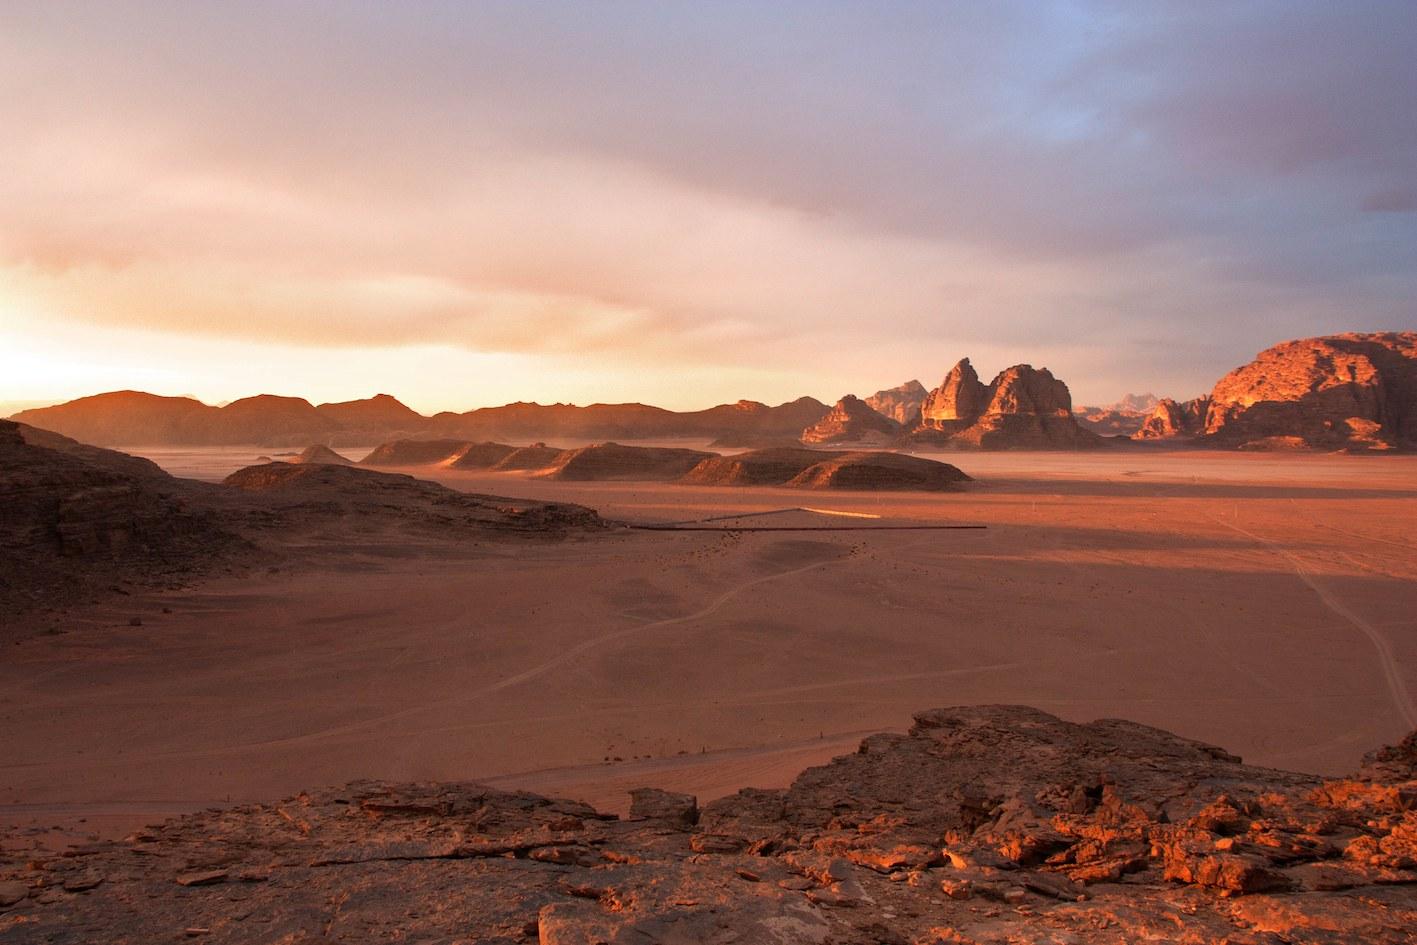 Sunset on the Wadi Rum Desert in Jordan. Picture from www.wadirum.jo